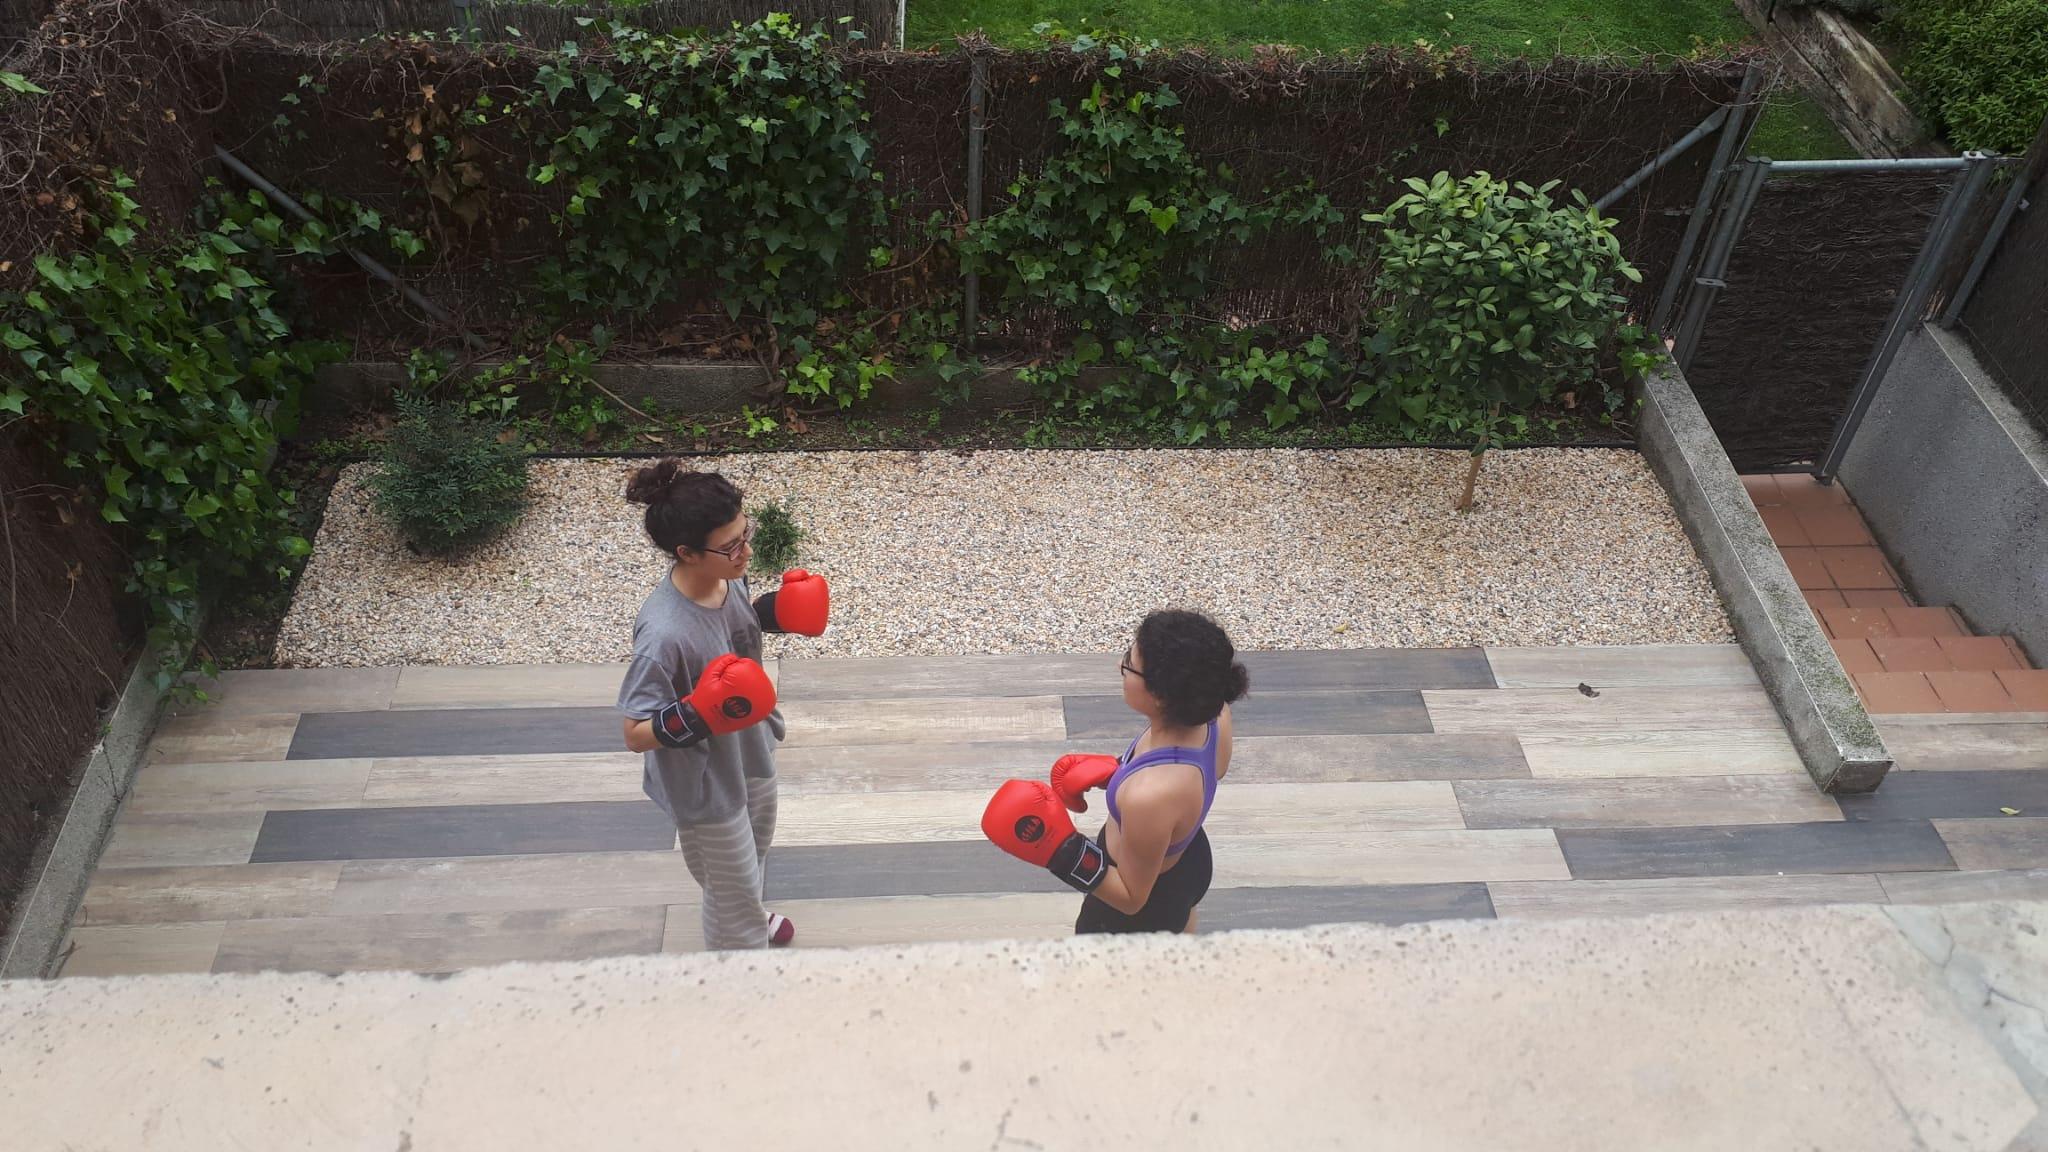 Fent boxa al pati.